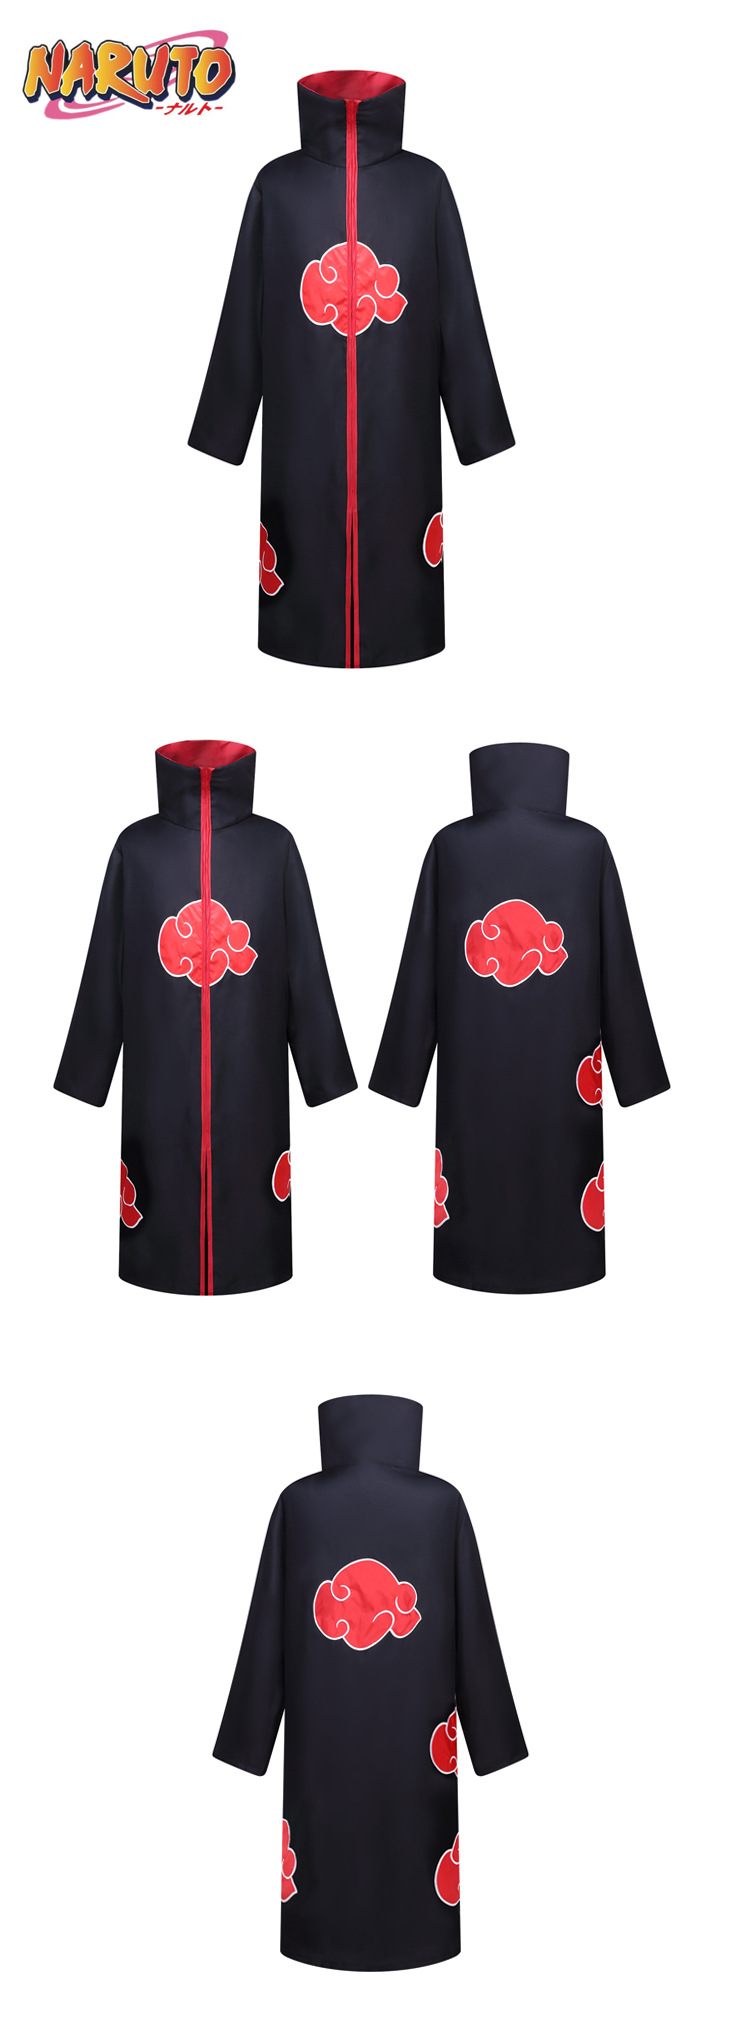 Halloween Fancy Dress Cloak Ninja Costume Embroidery Red Cloud Robe Unisex Zipper Long Sleeve Uniform Cosplay Hooded